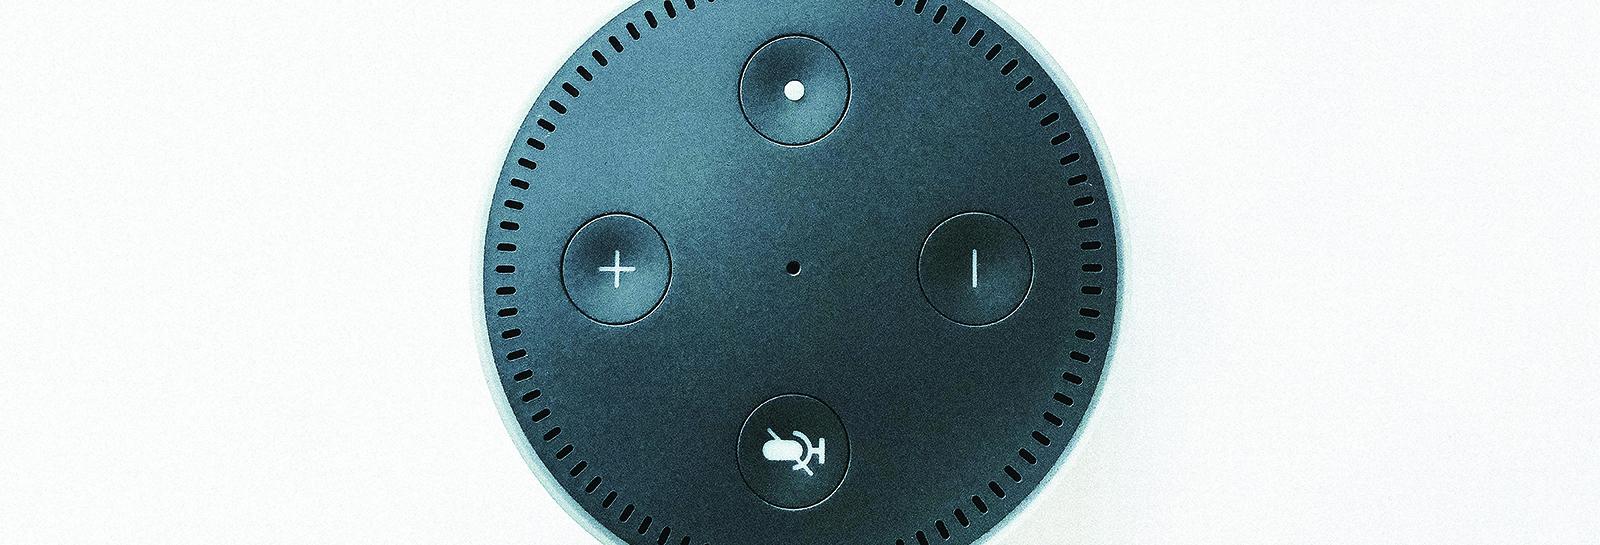 top view of an alexa speaker